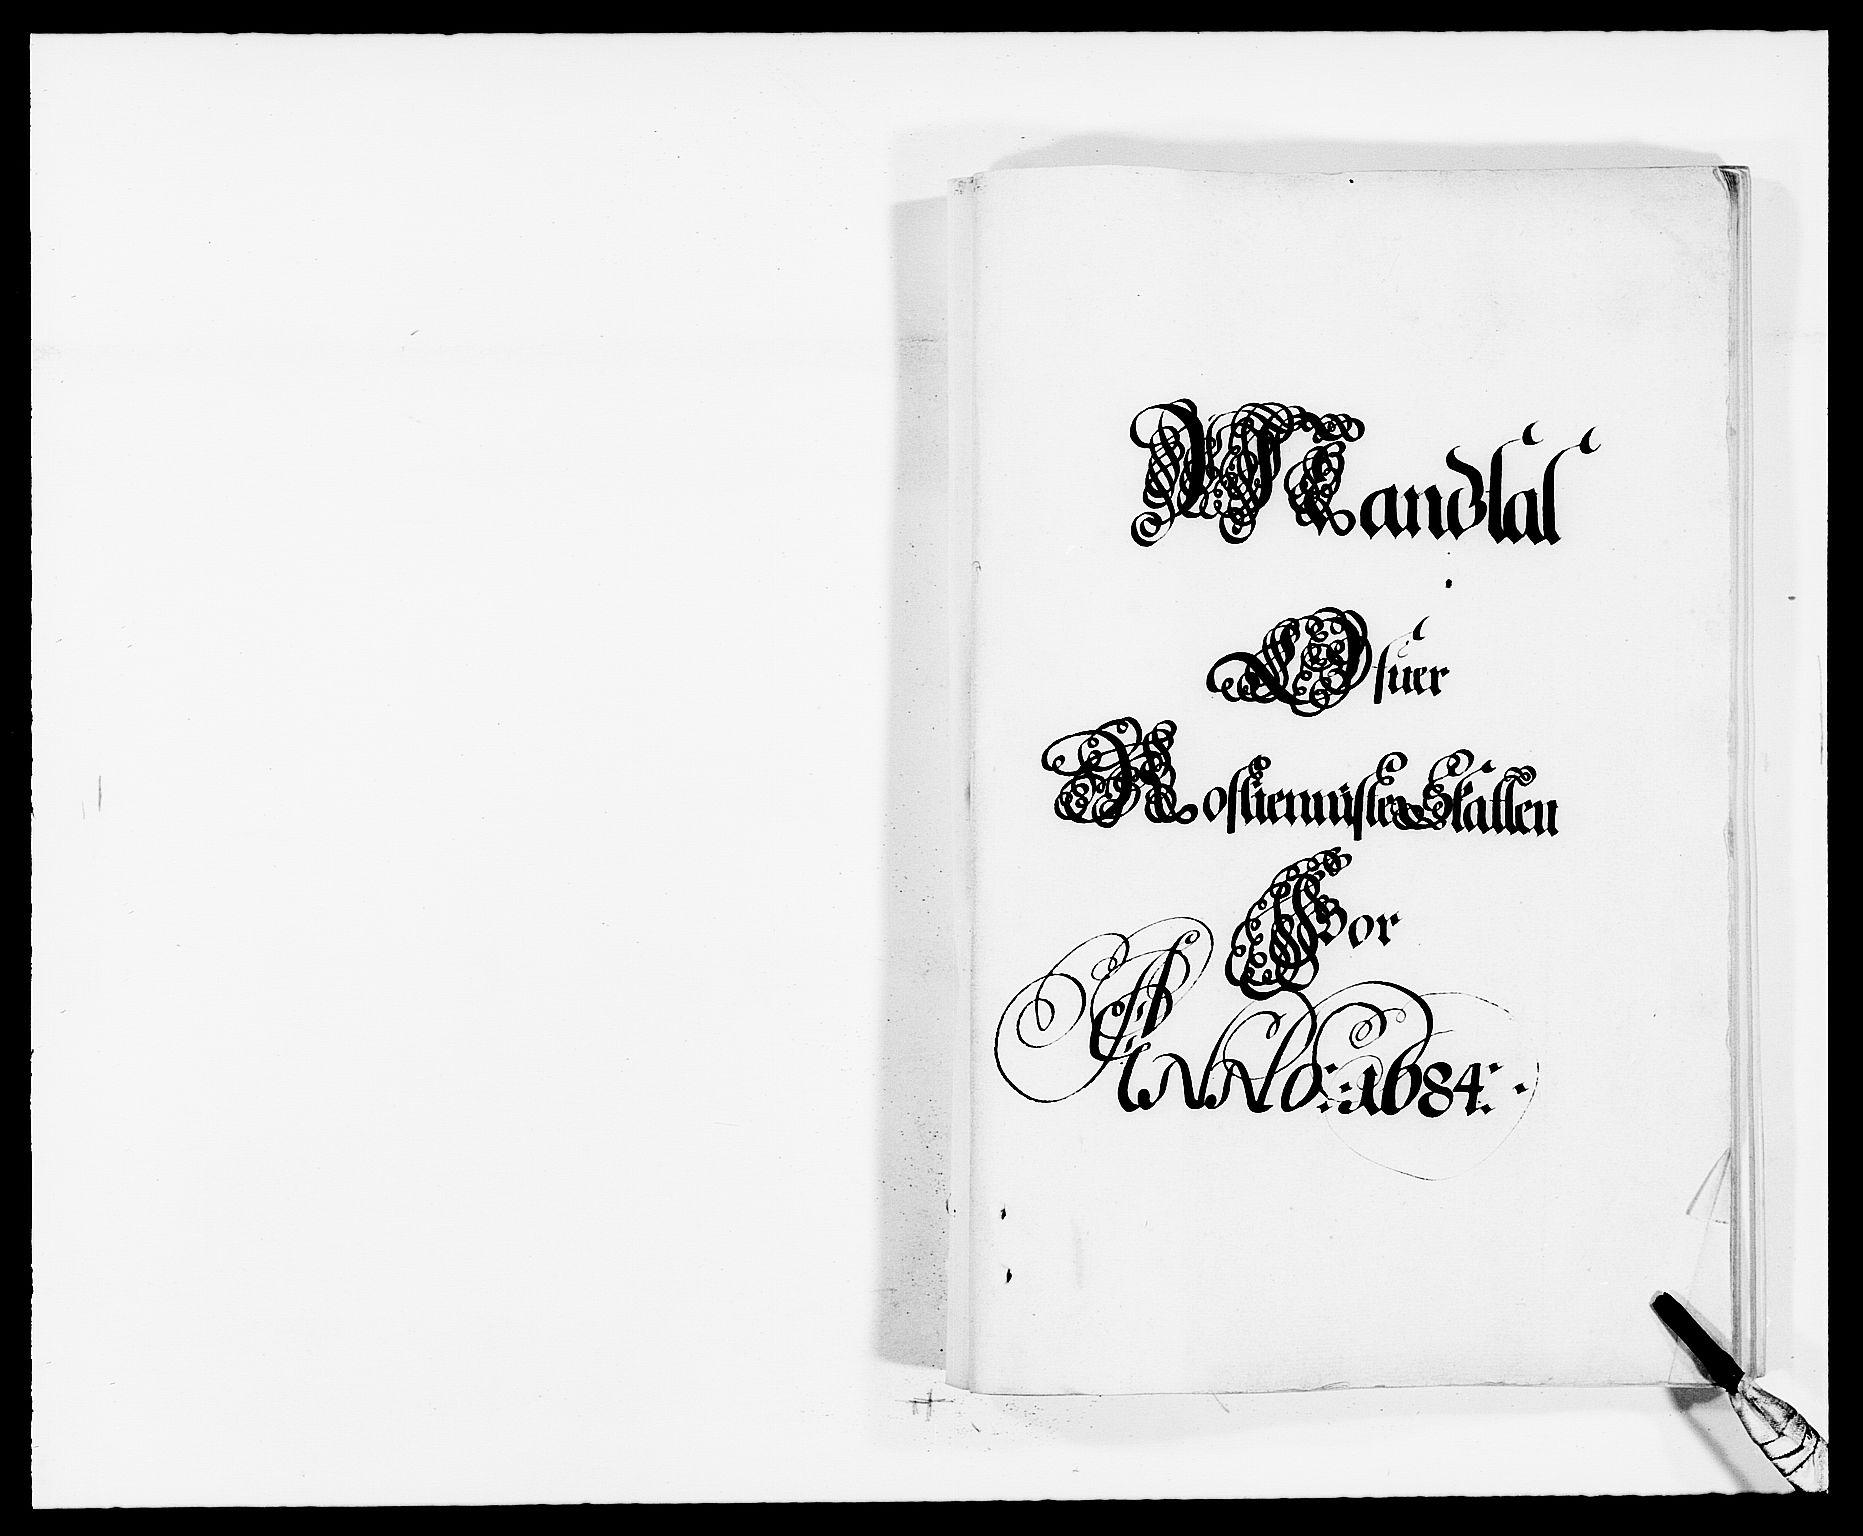 RA, Rentekammeret inntil 1814, Reviderte regnskaper, Fogderegnskap, R32/L1855: Fogderegnskap Jarlsberg grevskap, 1684, s. 1